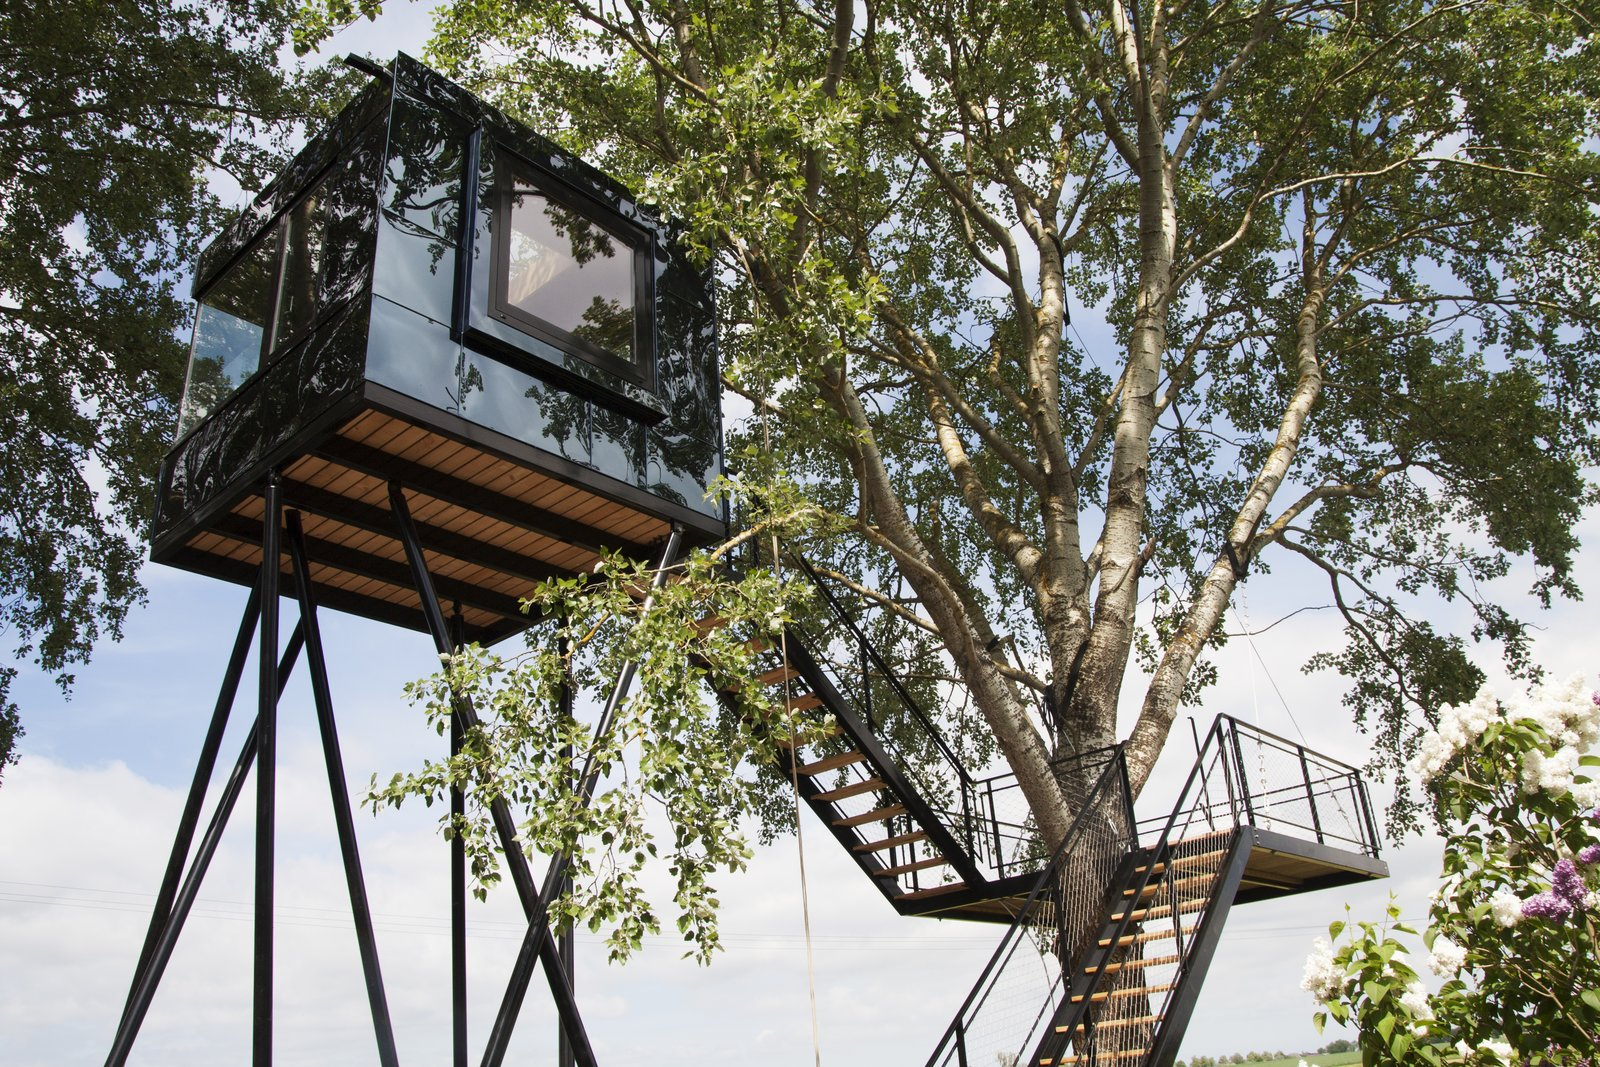 Black Beauty tree house